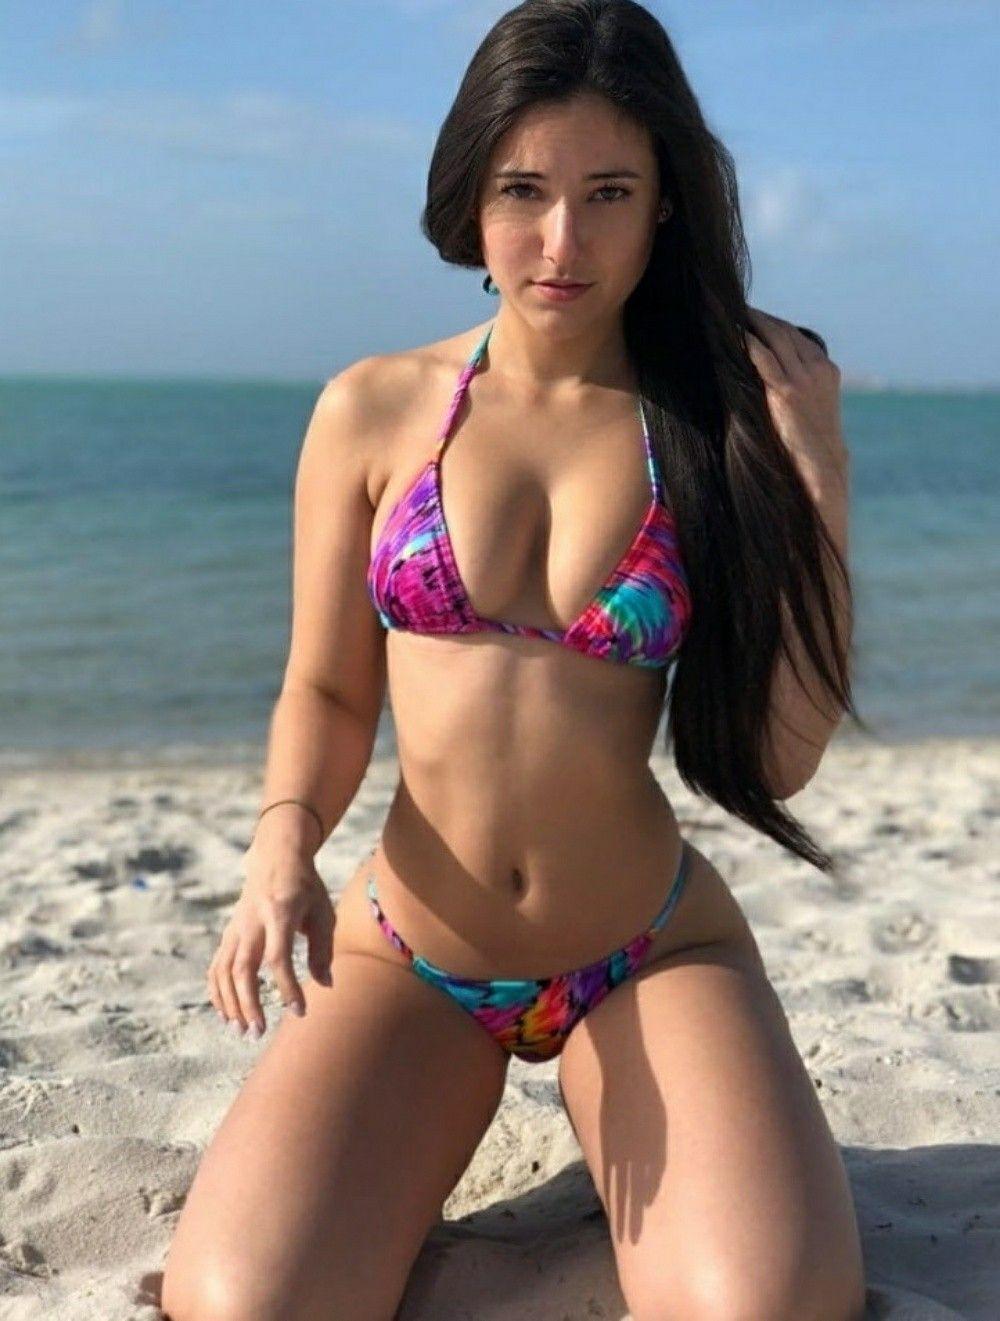 Bikini Caitlin Jean Stasey naked (49 photo), Ass, Sideboobs, Boobs, braless 2006